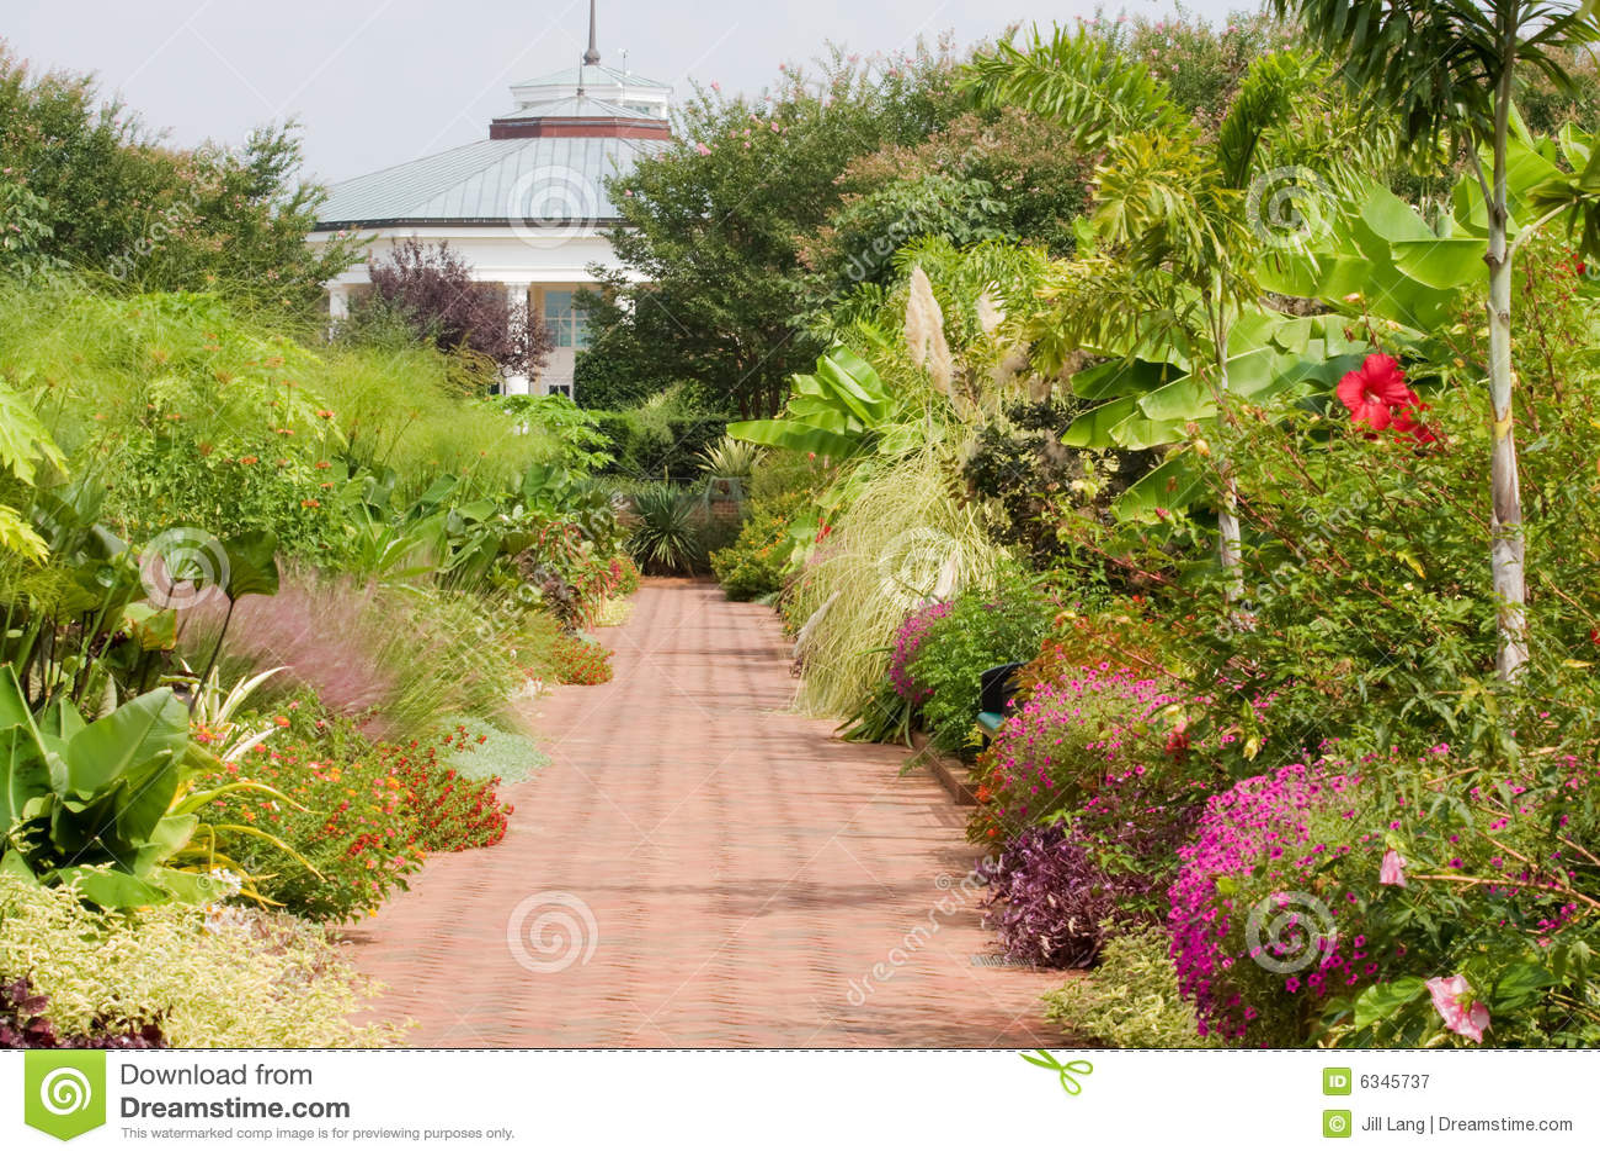 Botanical Garden Royalty Free Stock Photography Image 6345737